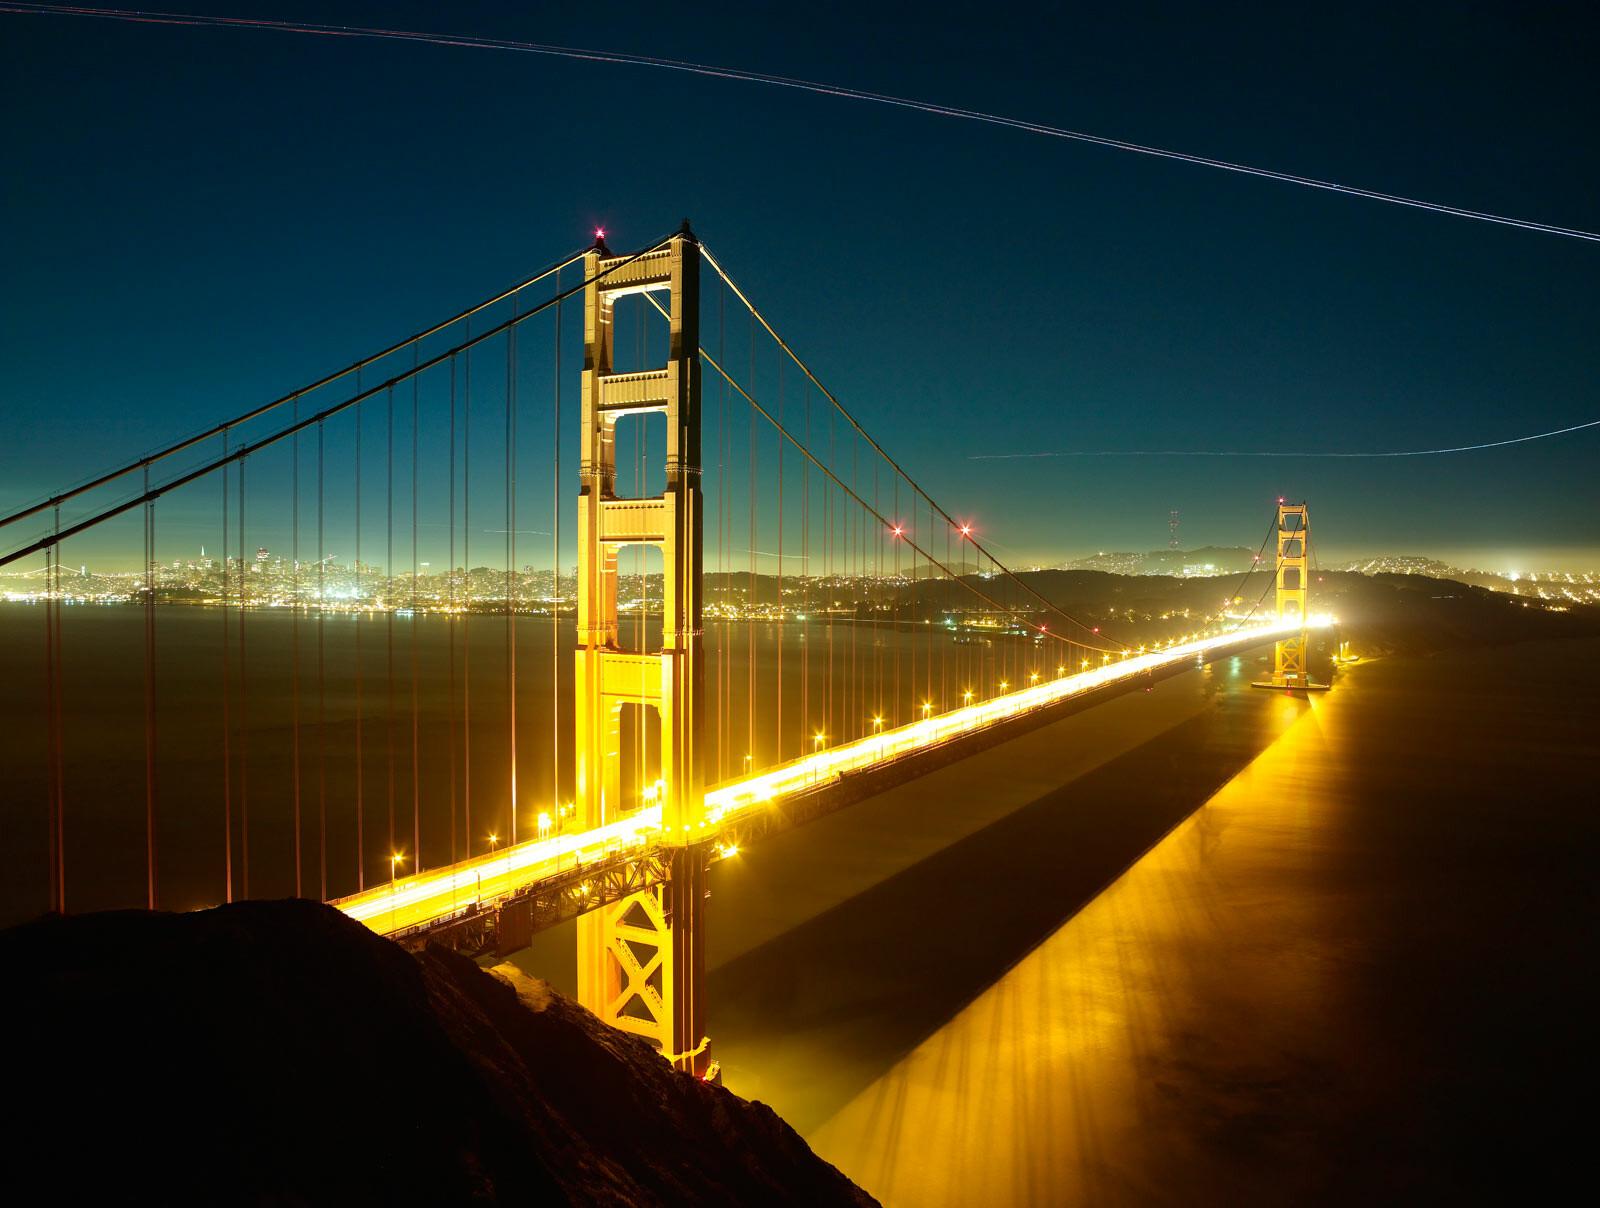 Golden Gate - Erik Chmil